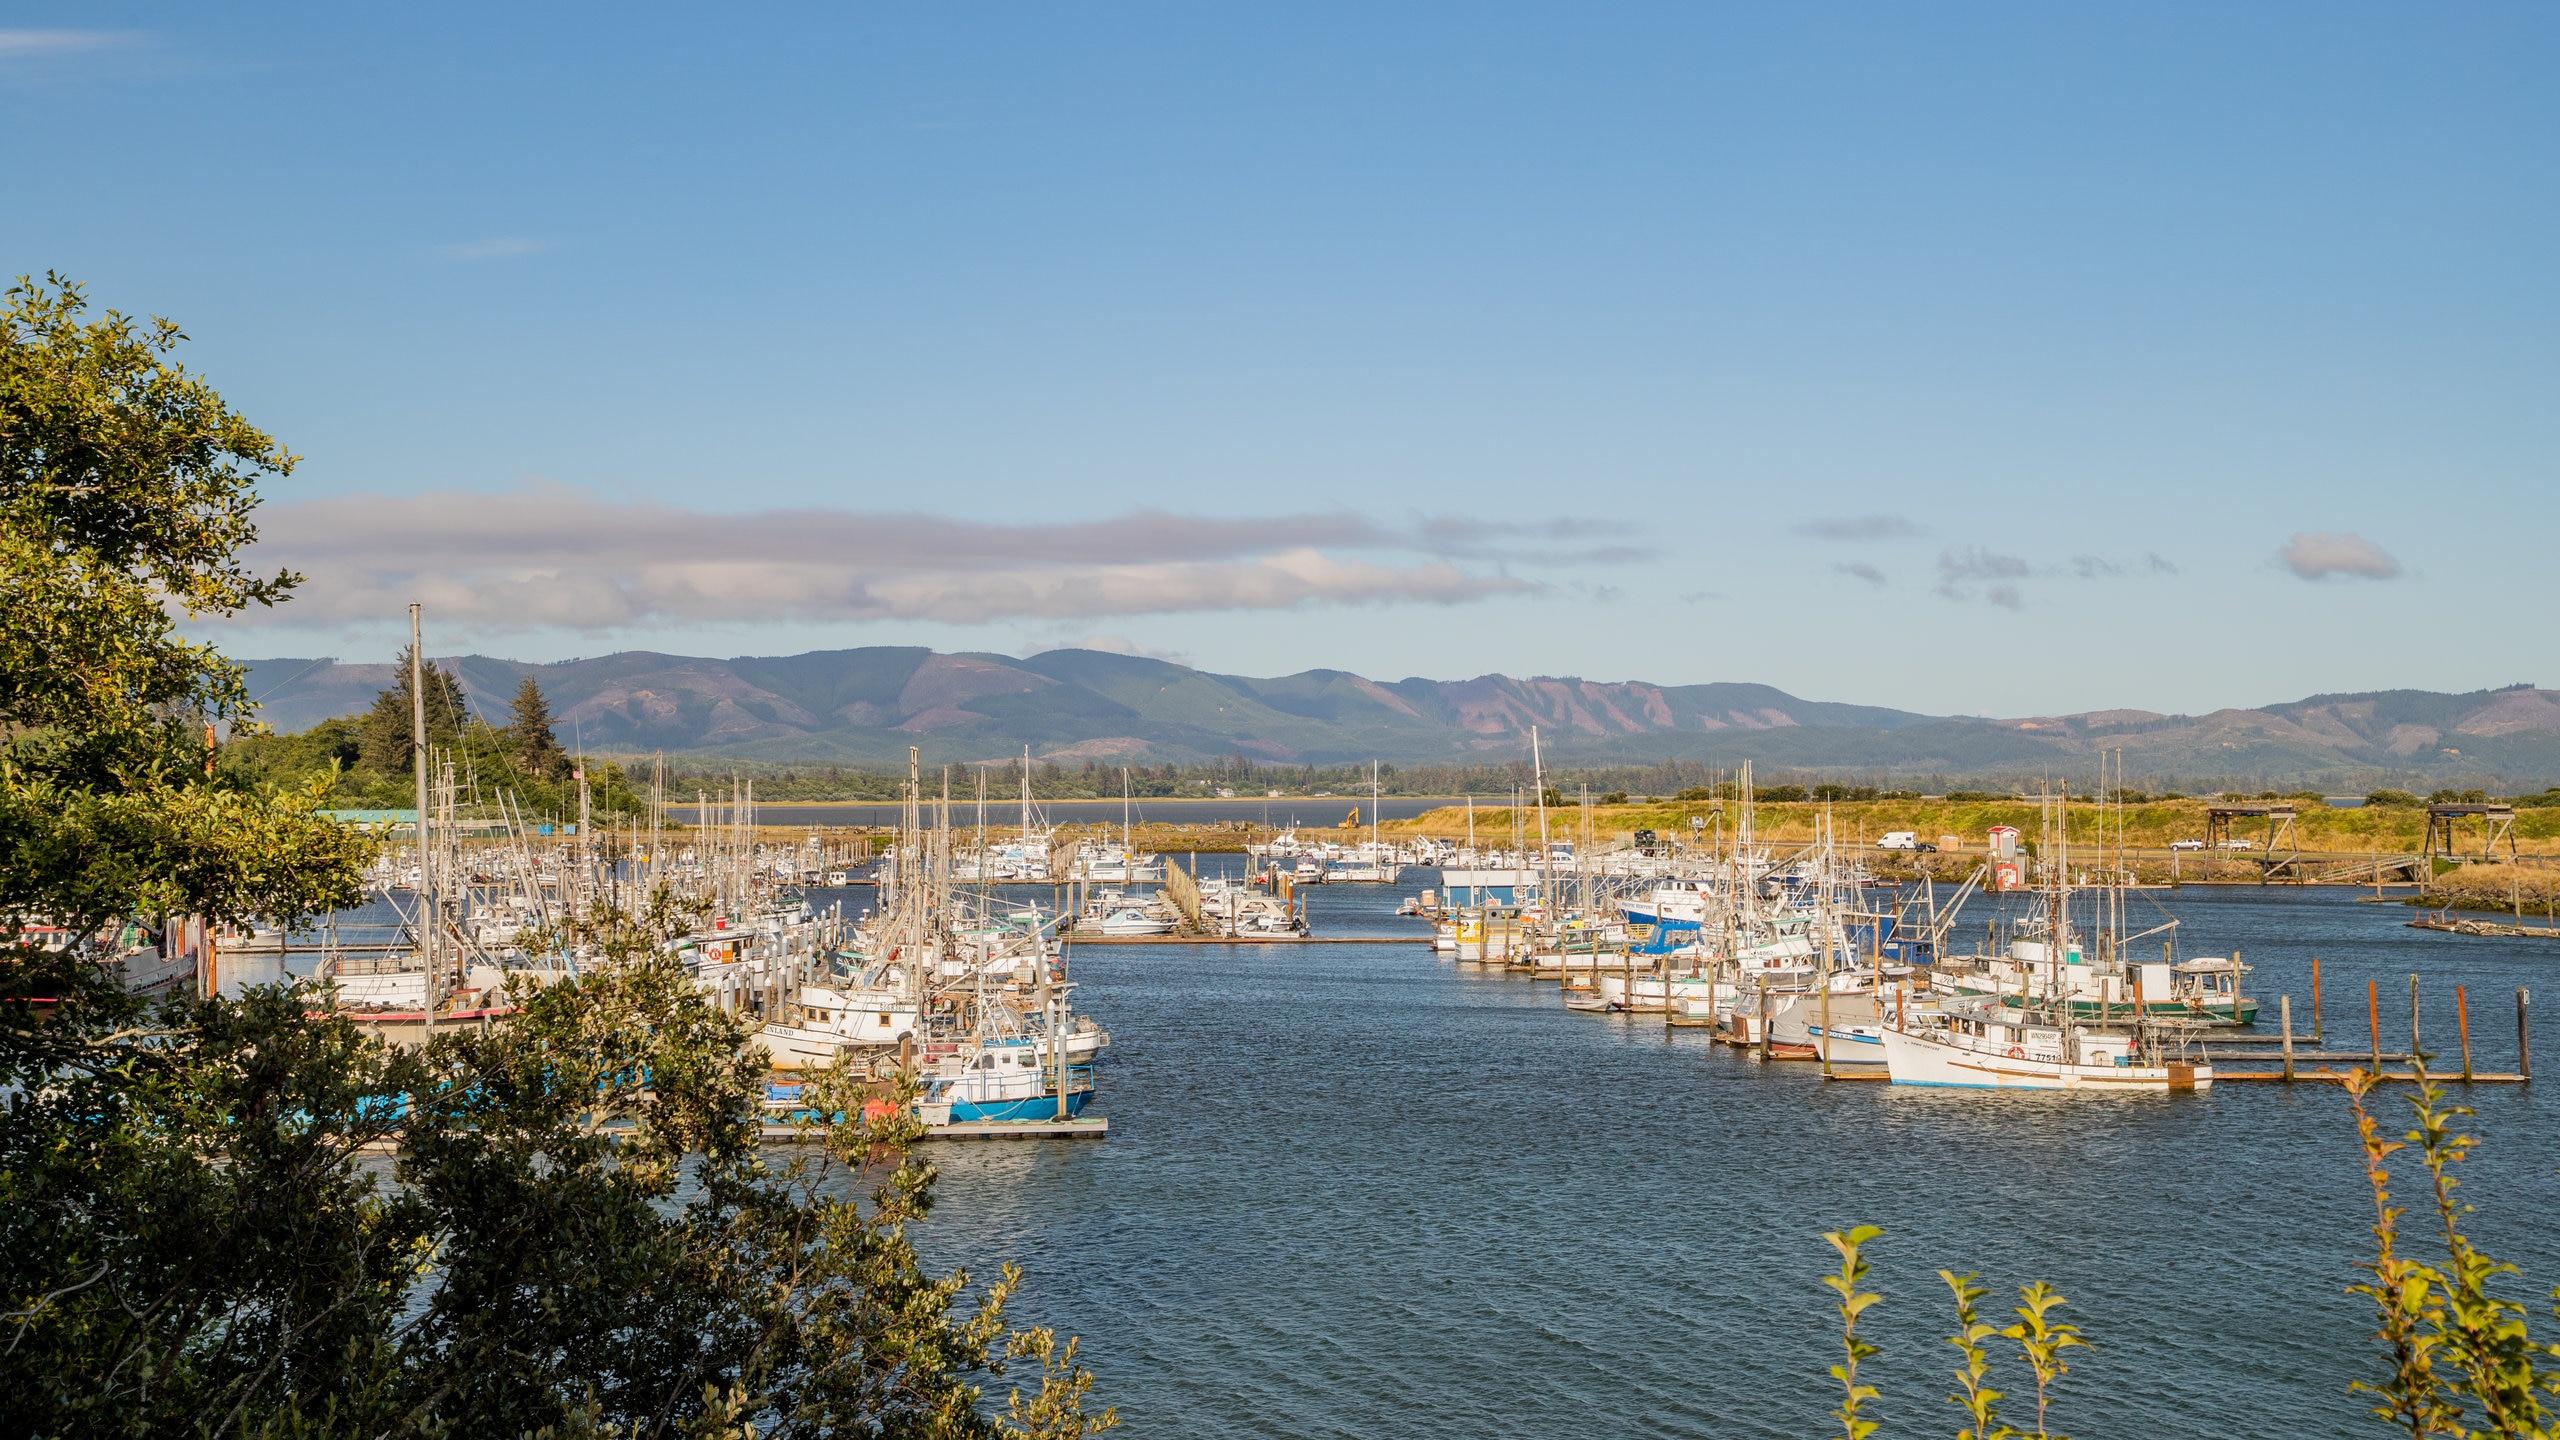 Pacific County, Washington, United States of America